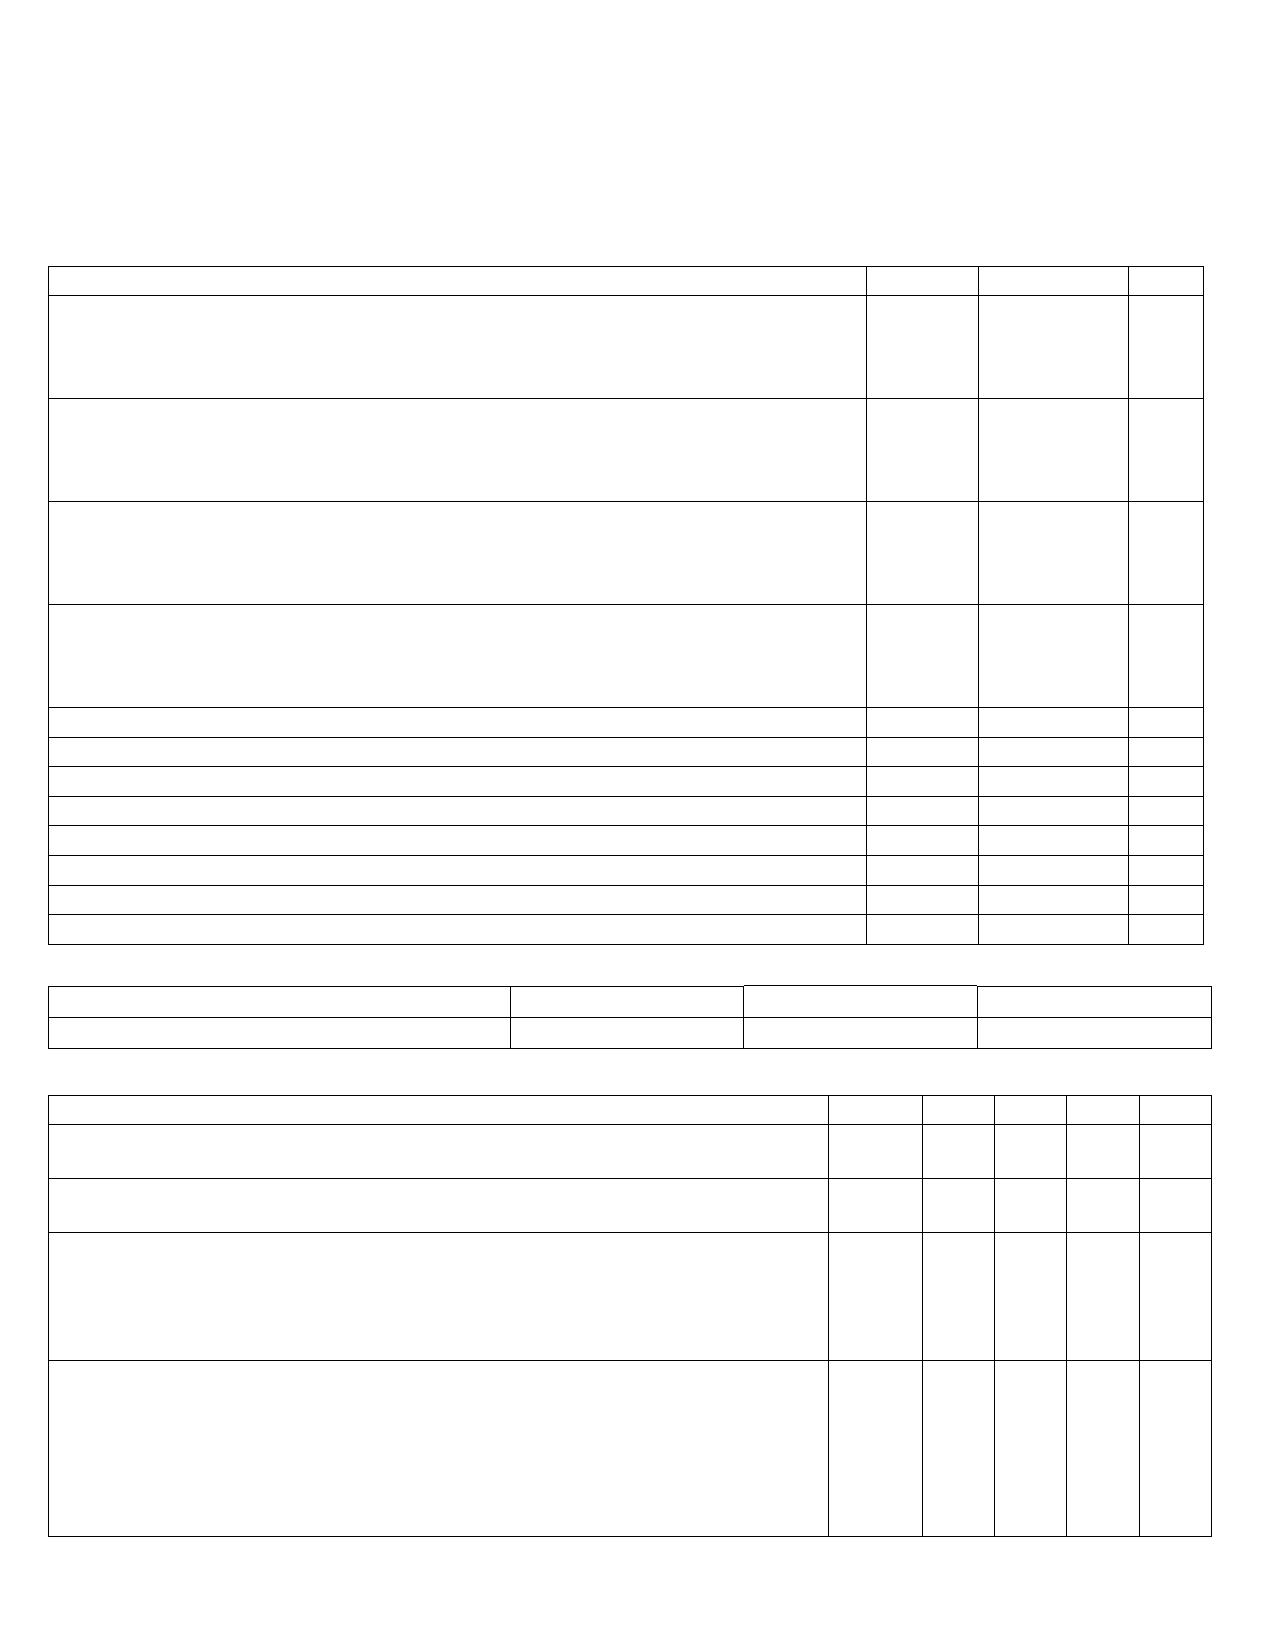 BT162-600 Datasheet, BT162-600 PDF,ピン配置, 機能